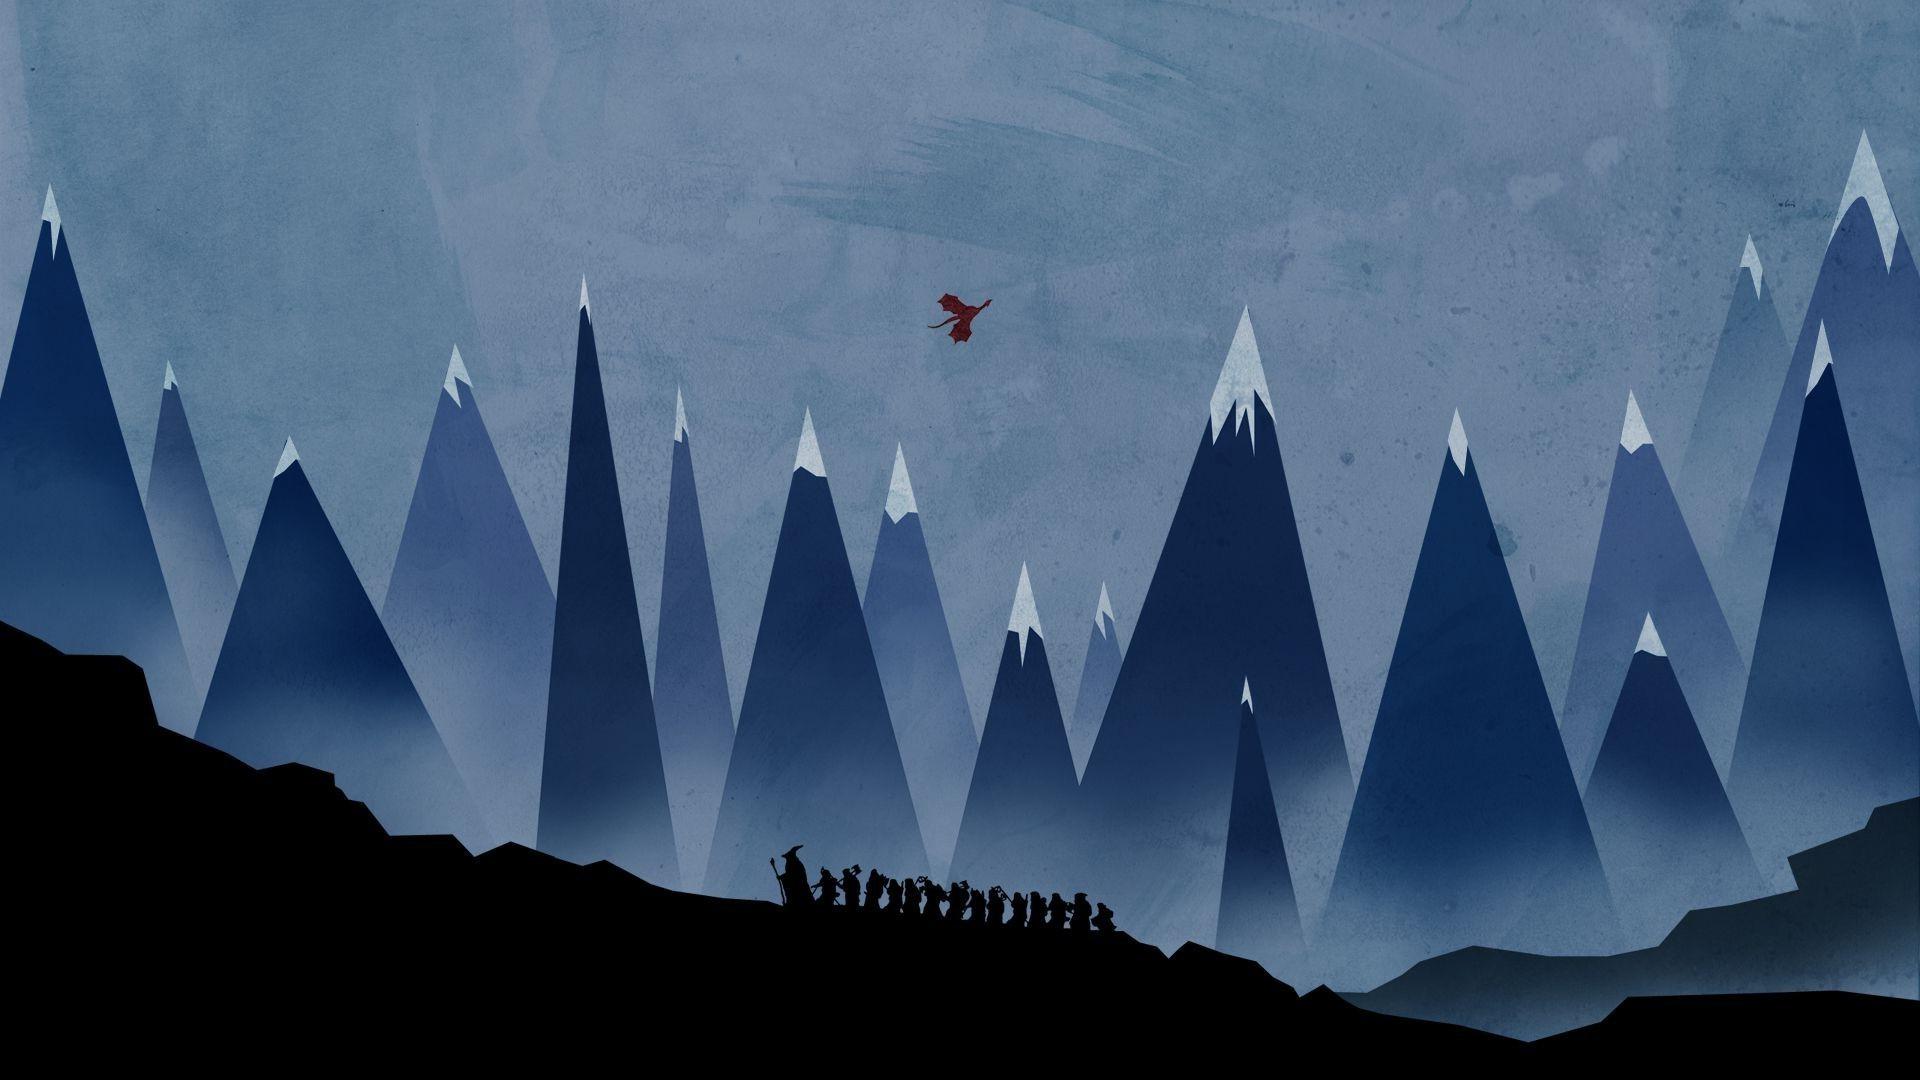 The Hobbit Minimalism Gandalf Mountain Smaug Wallpapers HD 1920x1080